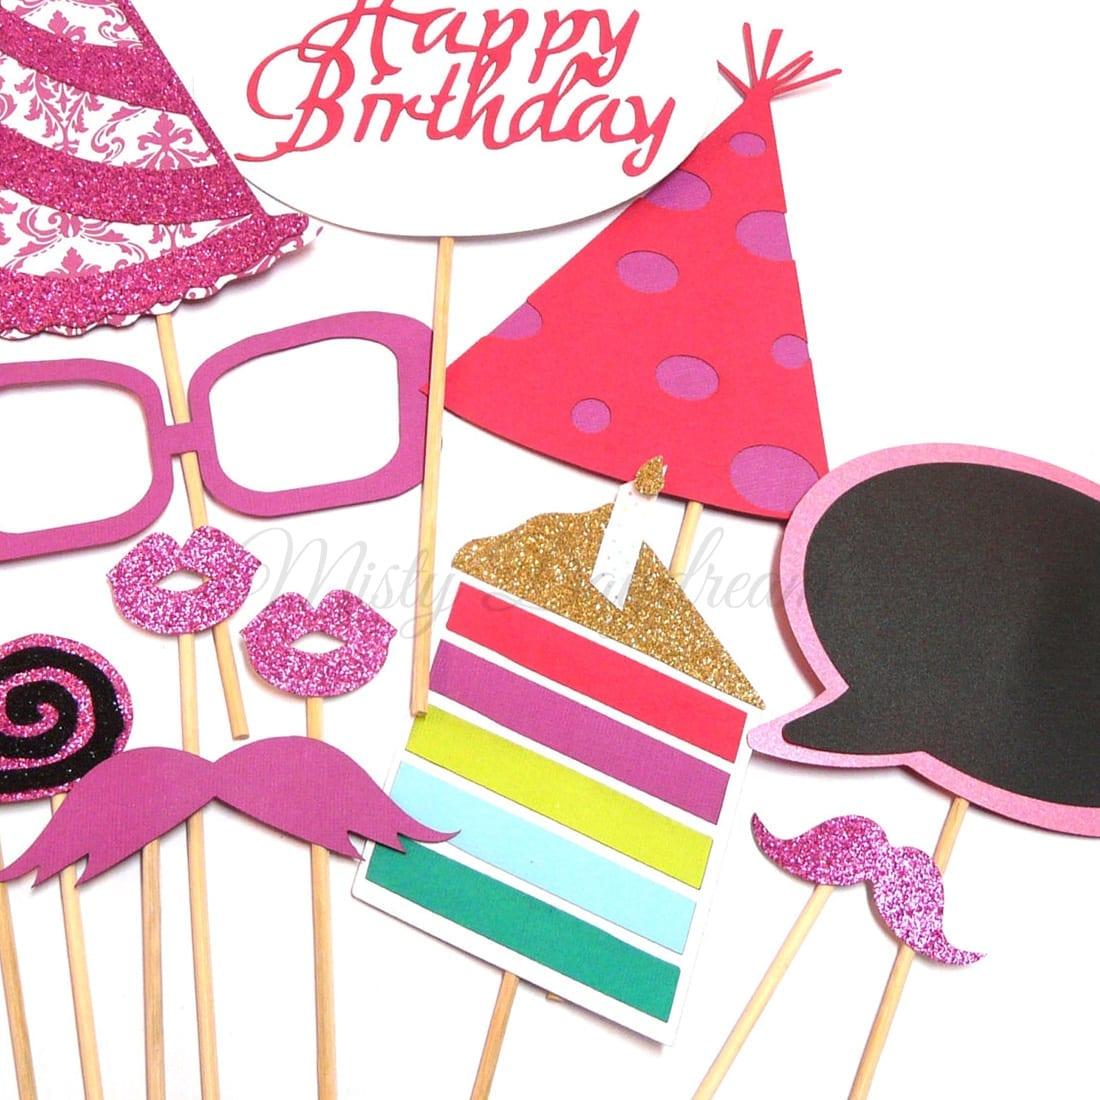 Glitter Happy Birthday Pink Photobooth Props Set Of 18